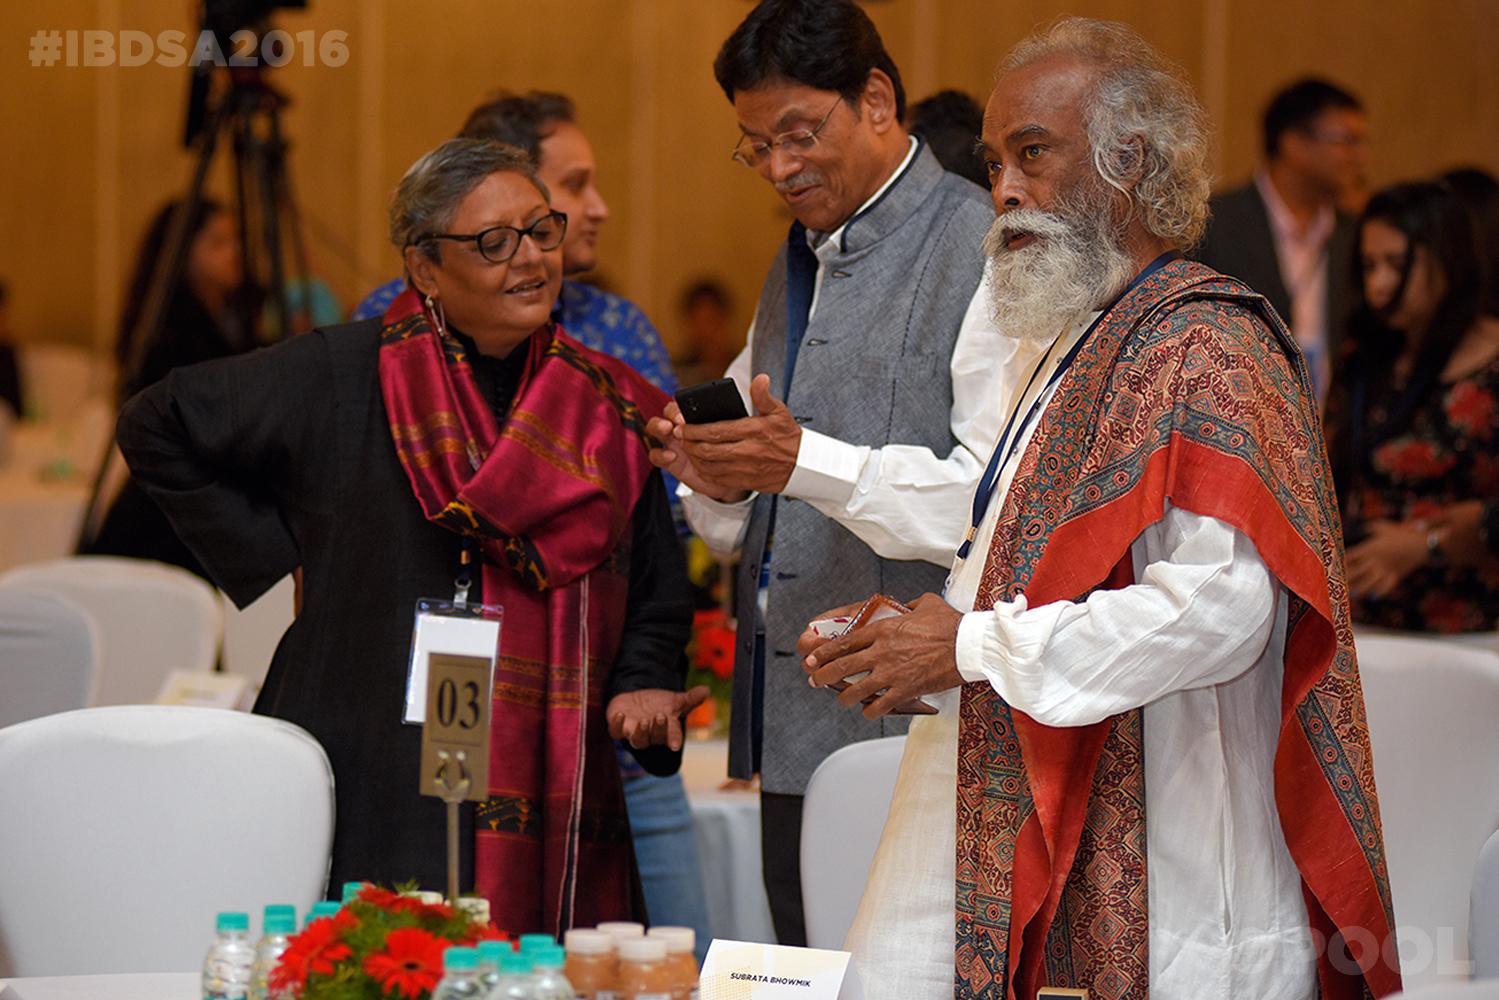 Krishna Amin, Subrata Bhowmick & Shrikant Nivasarkar